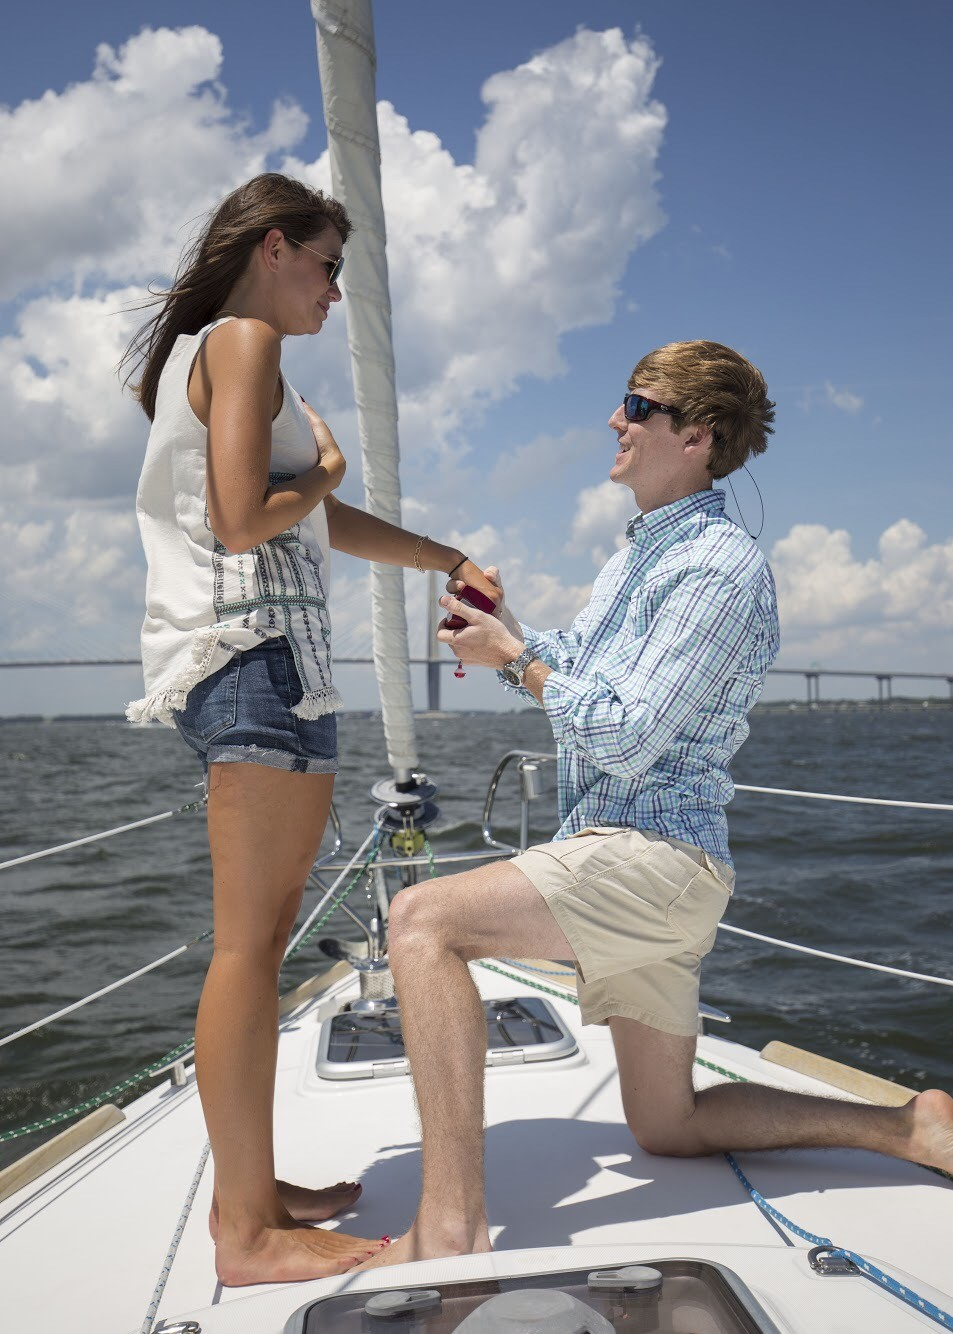 Image 4 of Katie and Landon's Charleston Yacht Proposal